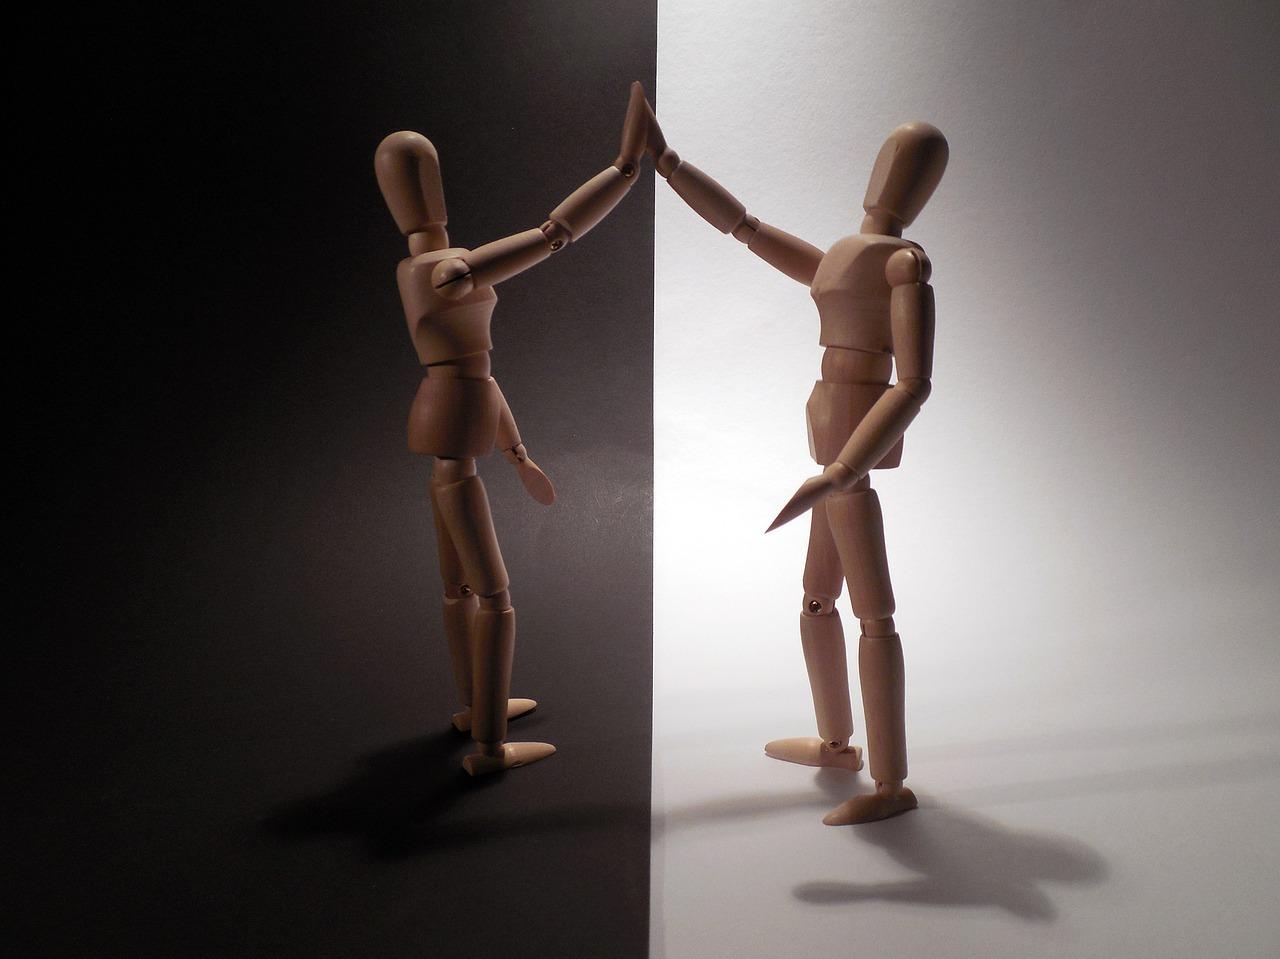 wood artwork reconciliation